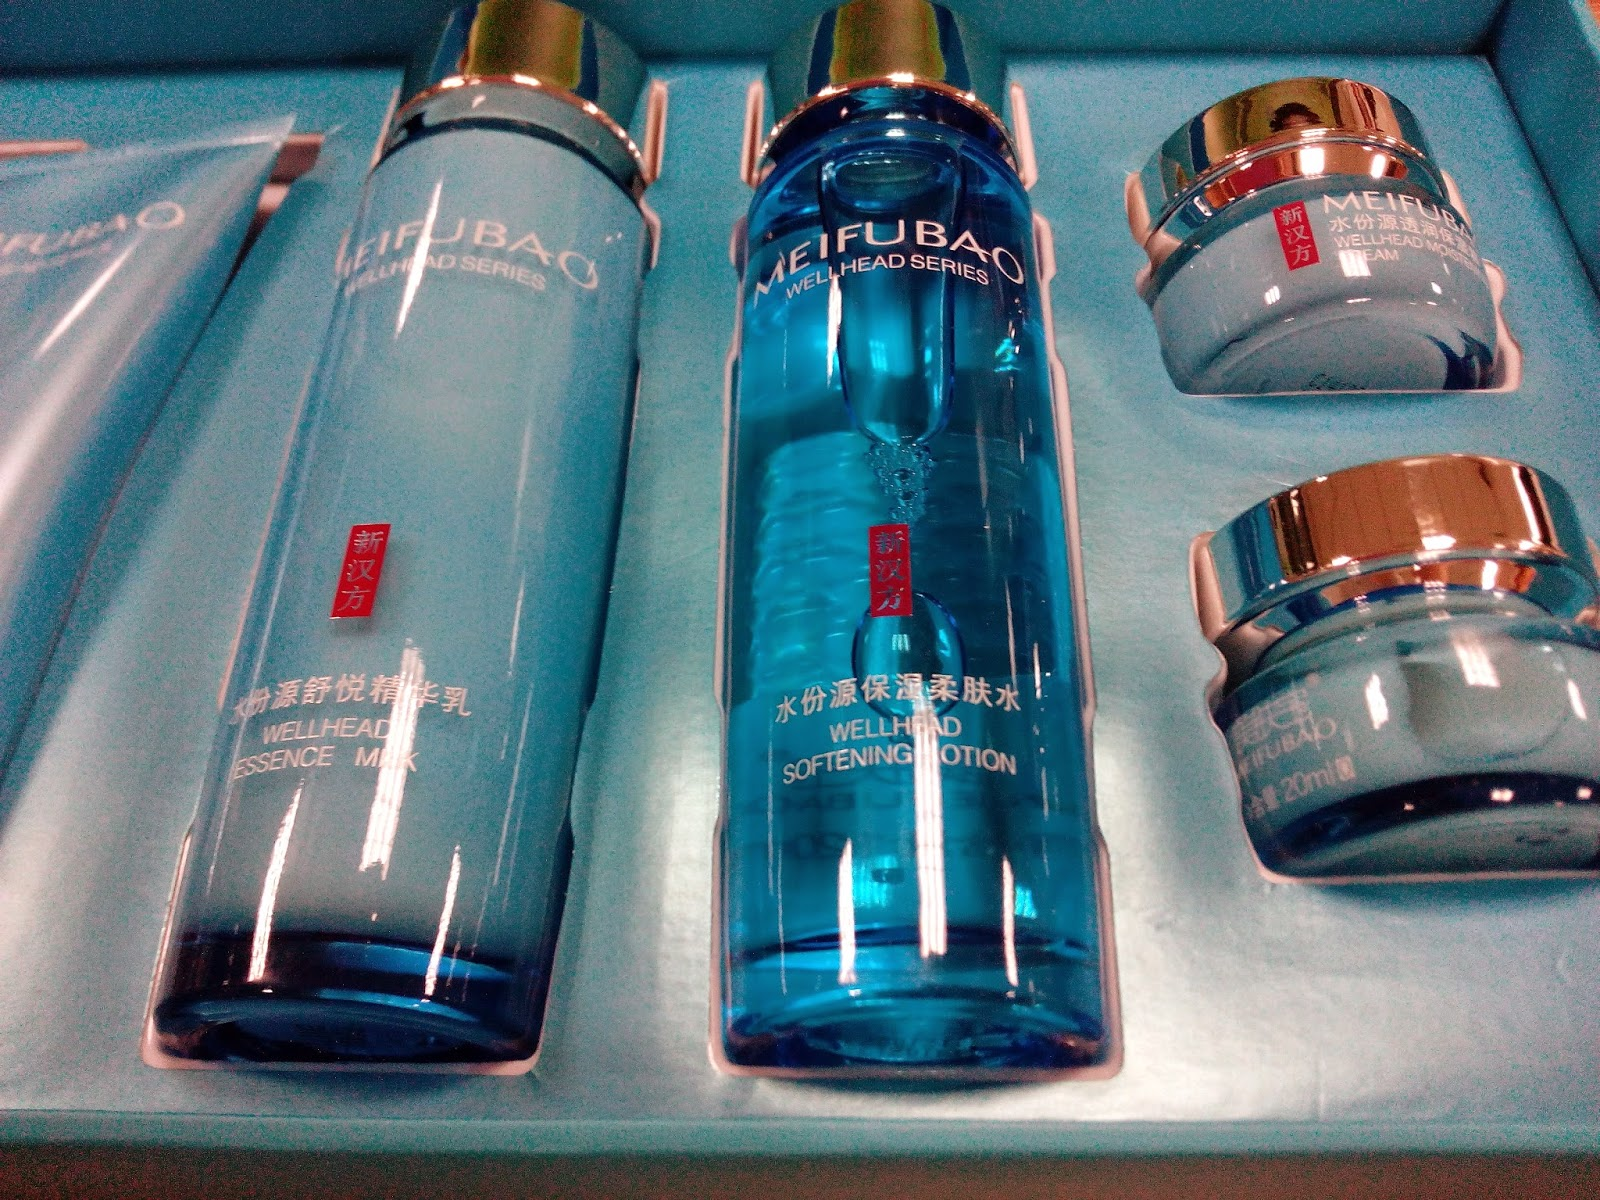 Cosmetics November 11 - MEIFUBAO 3